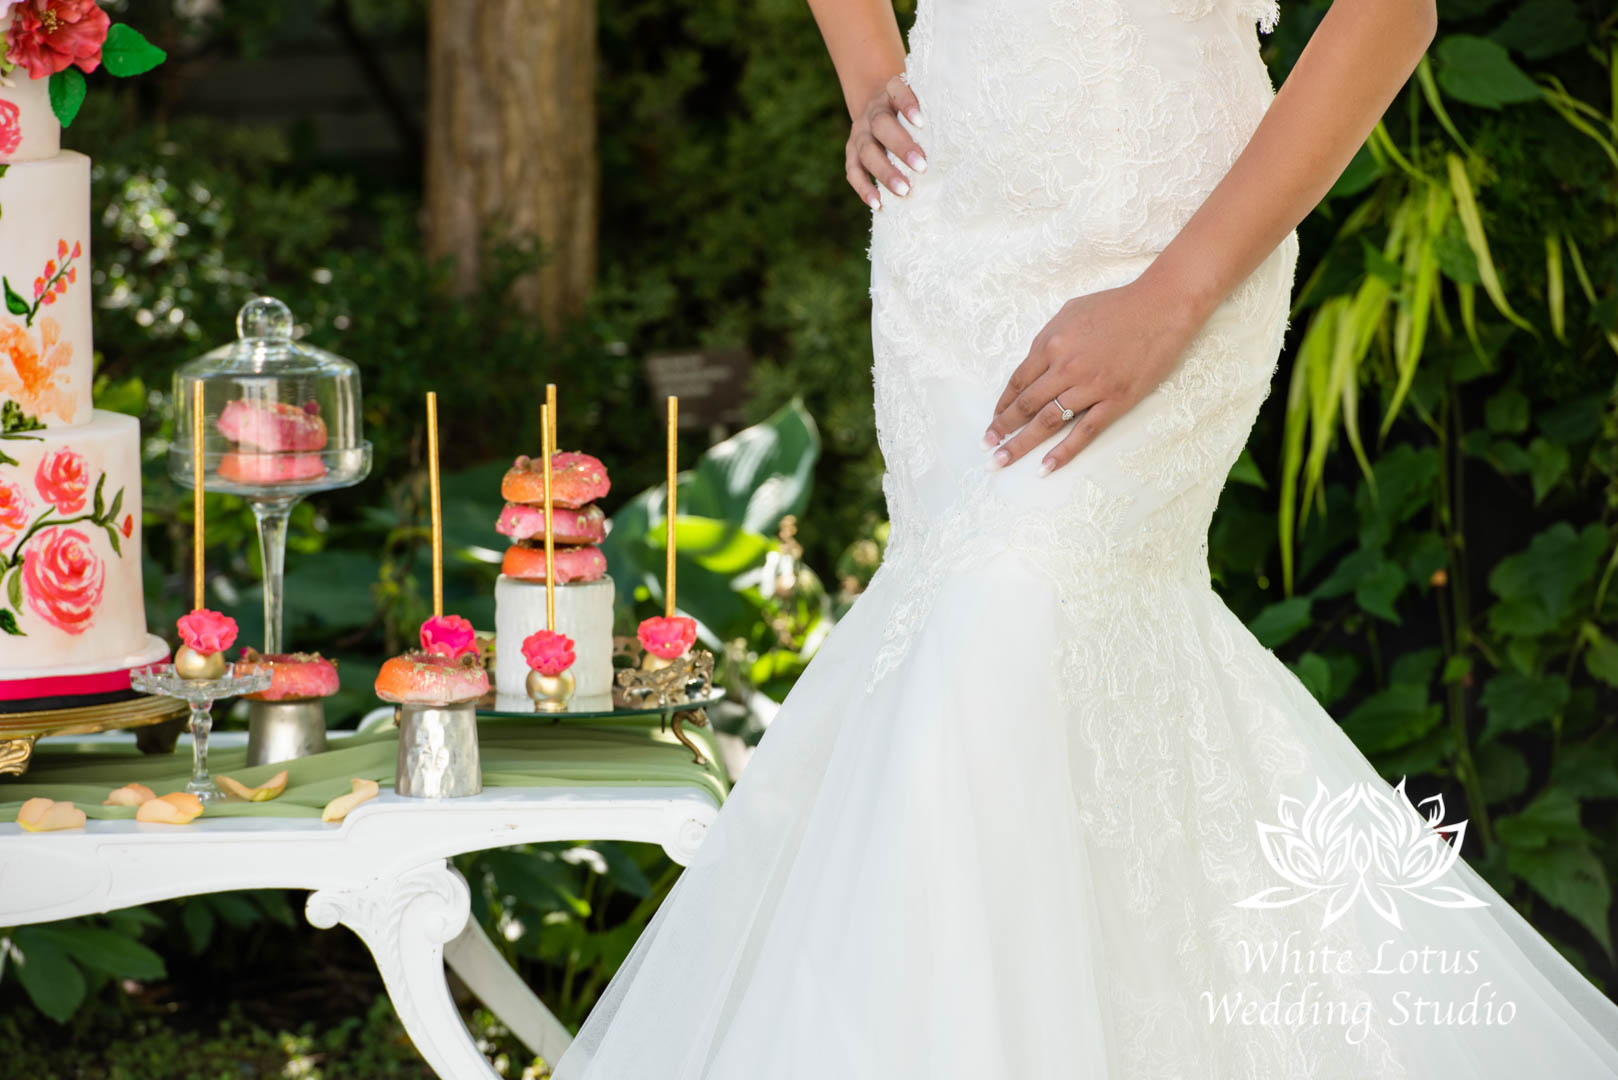 058- SPRING GARDEN WEDDING INSPIRATION